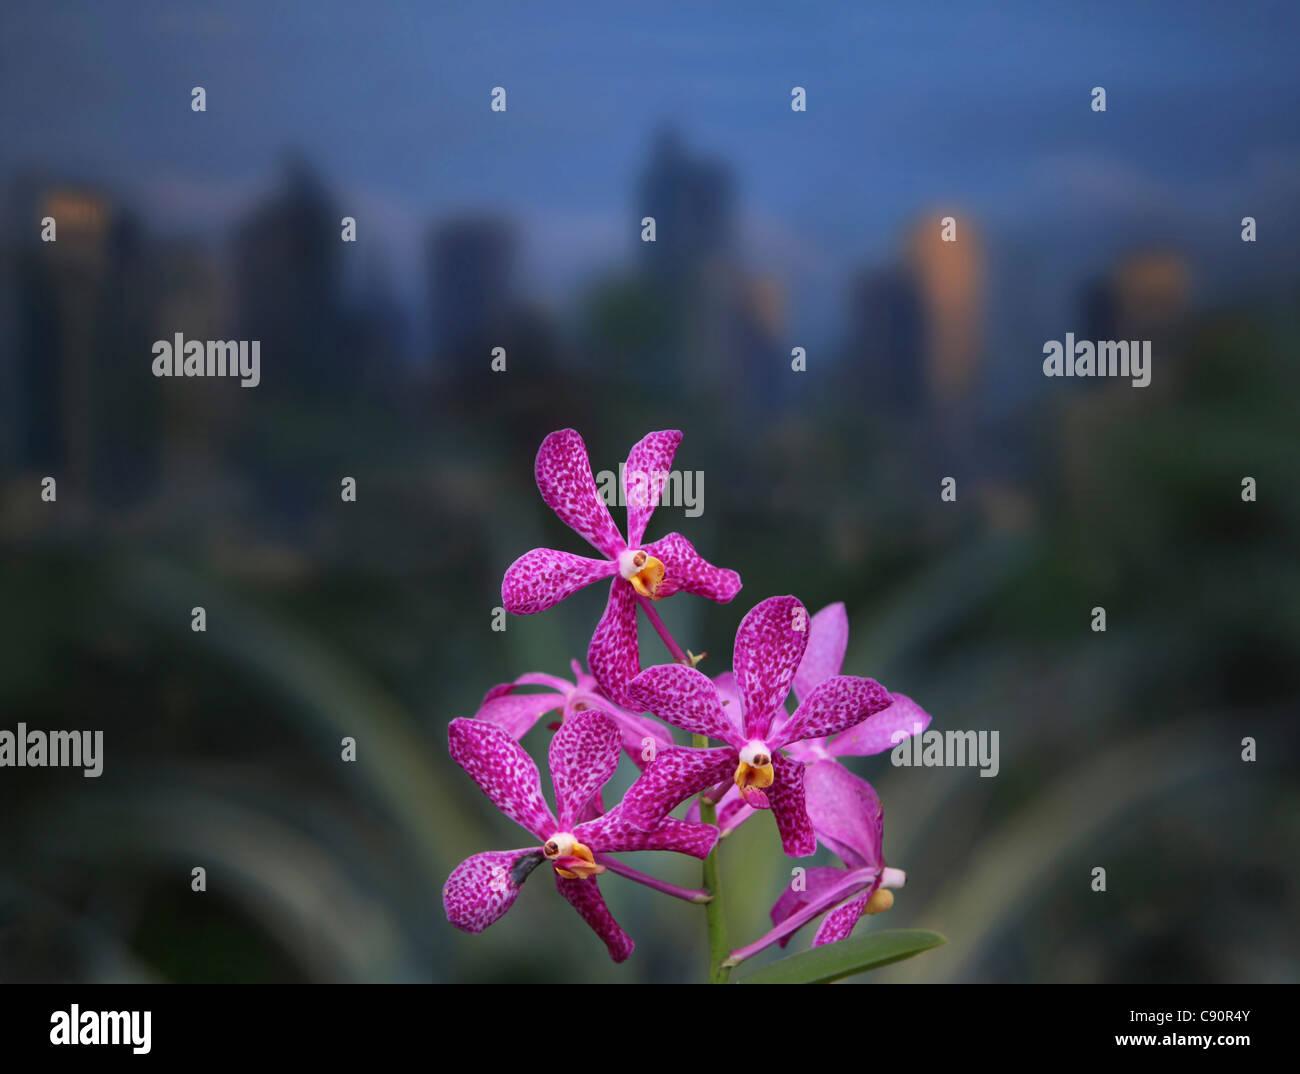 Orchideen im Greenbelt Park in Makati, Manila, Makati City, Manila, Insel Luzon, Philippinen, Asien Stockbild